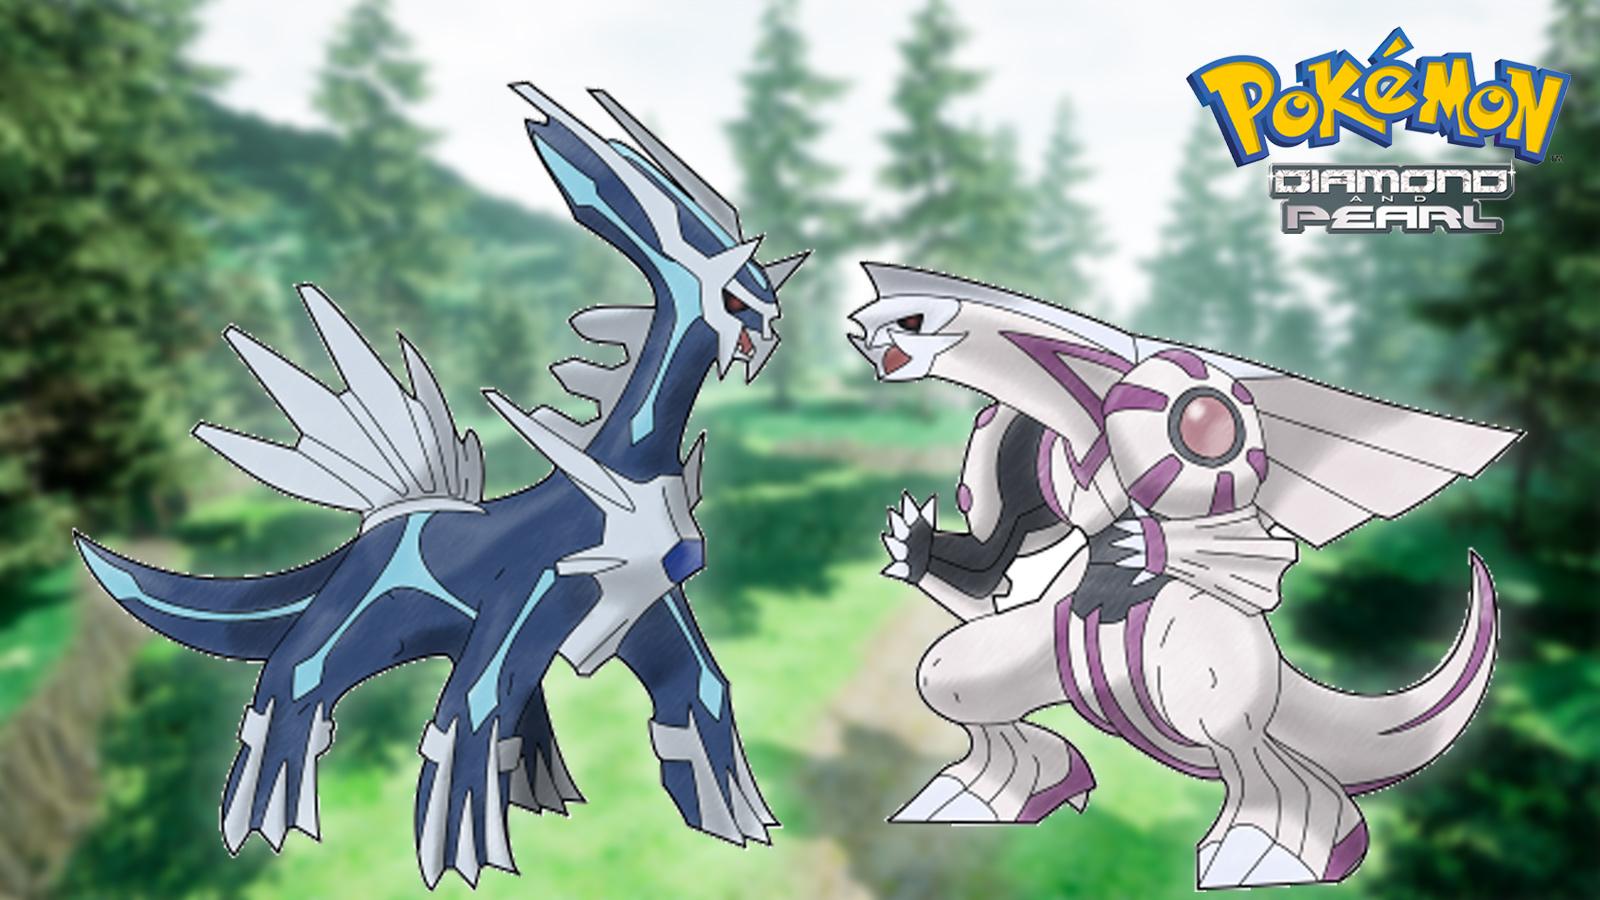 Pokemon Diamond and Pearl Unreal Engine remake